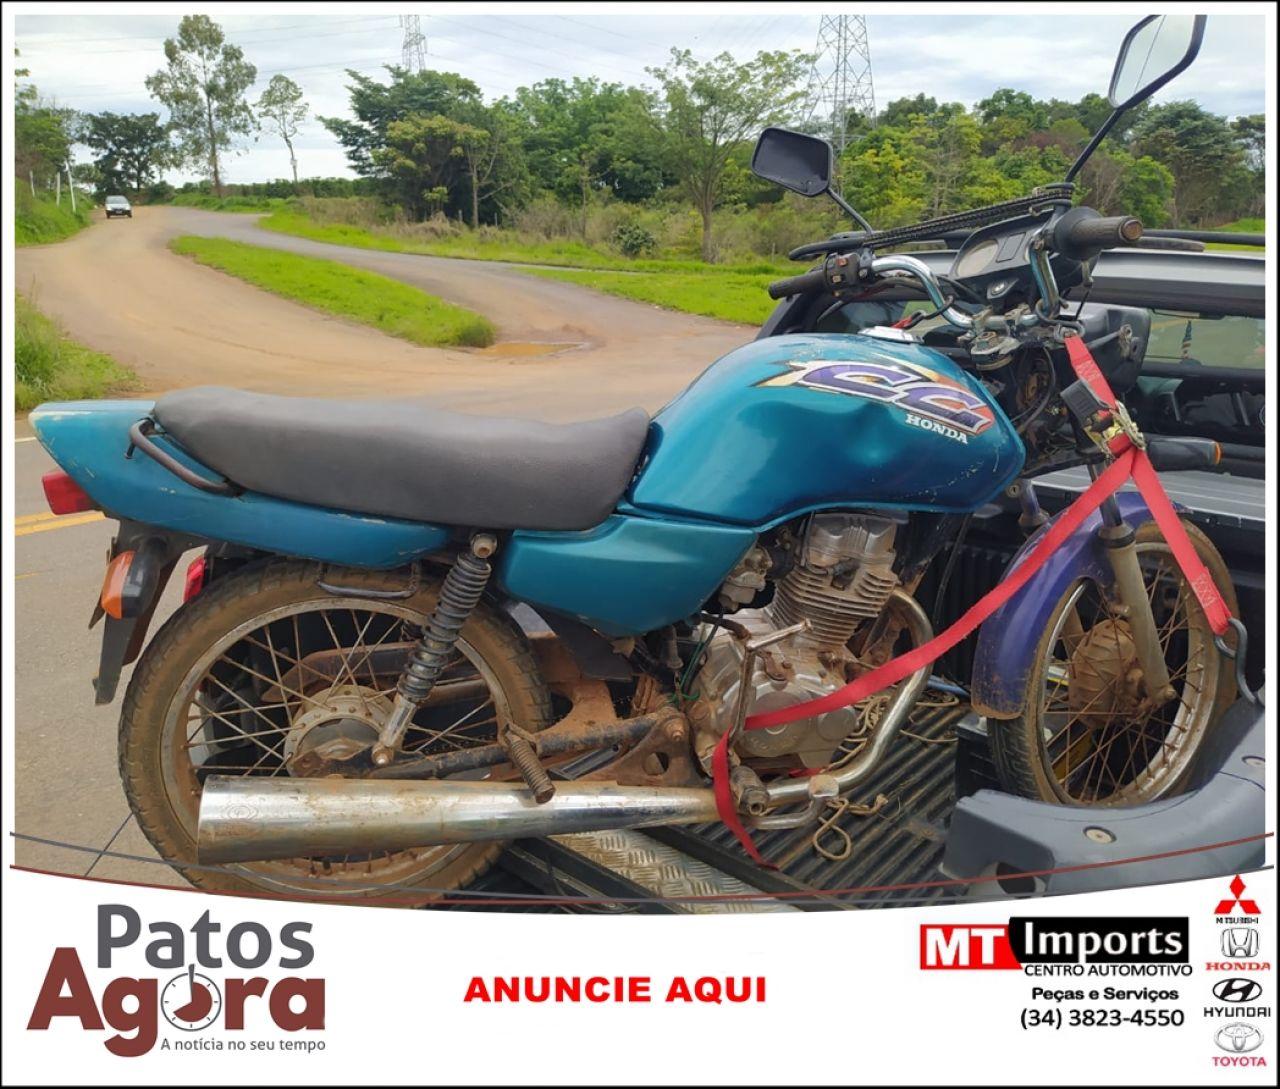 PMRv apreende motocicleta com chassi raspado na rodovia MG 235